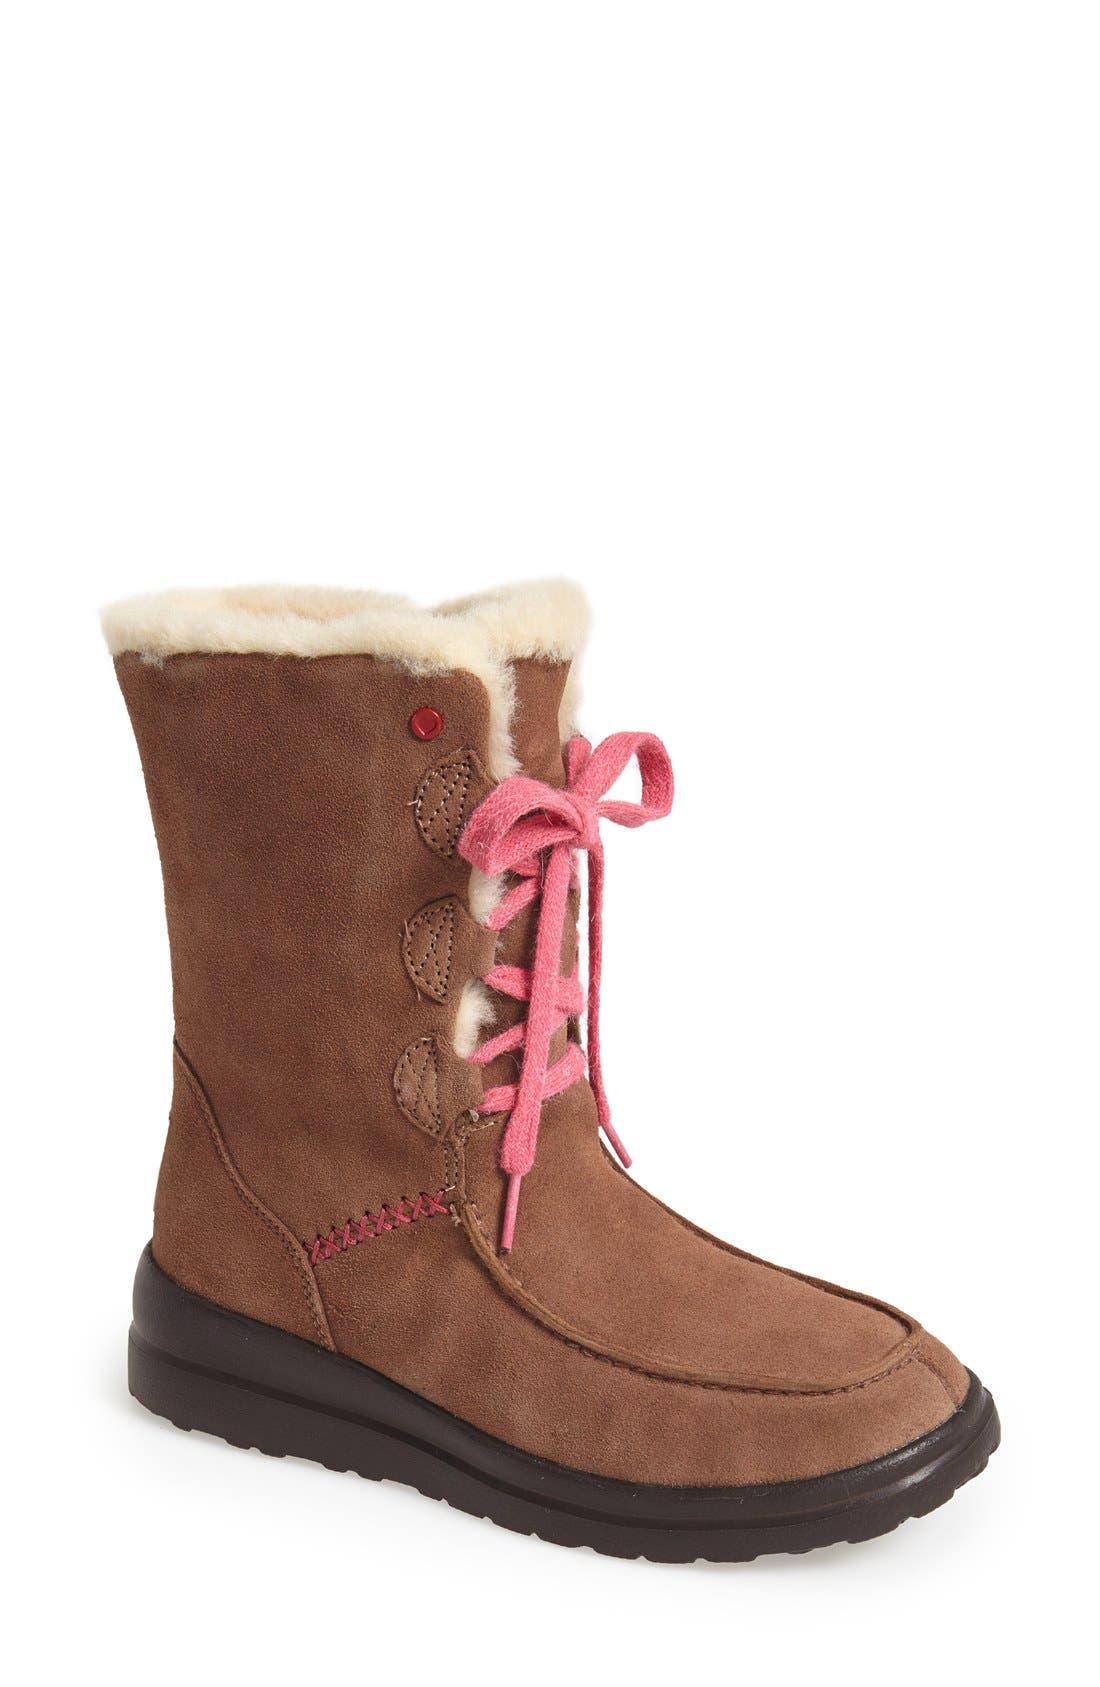 Main Image - I Heart UGG™ by UGG® Australia 'Lacy' Short Boot